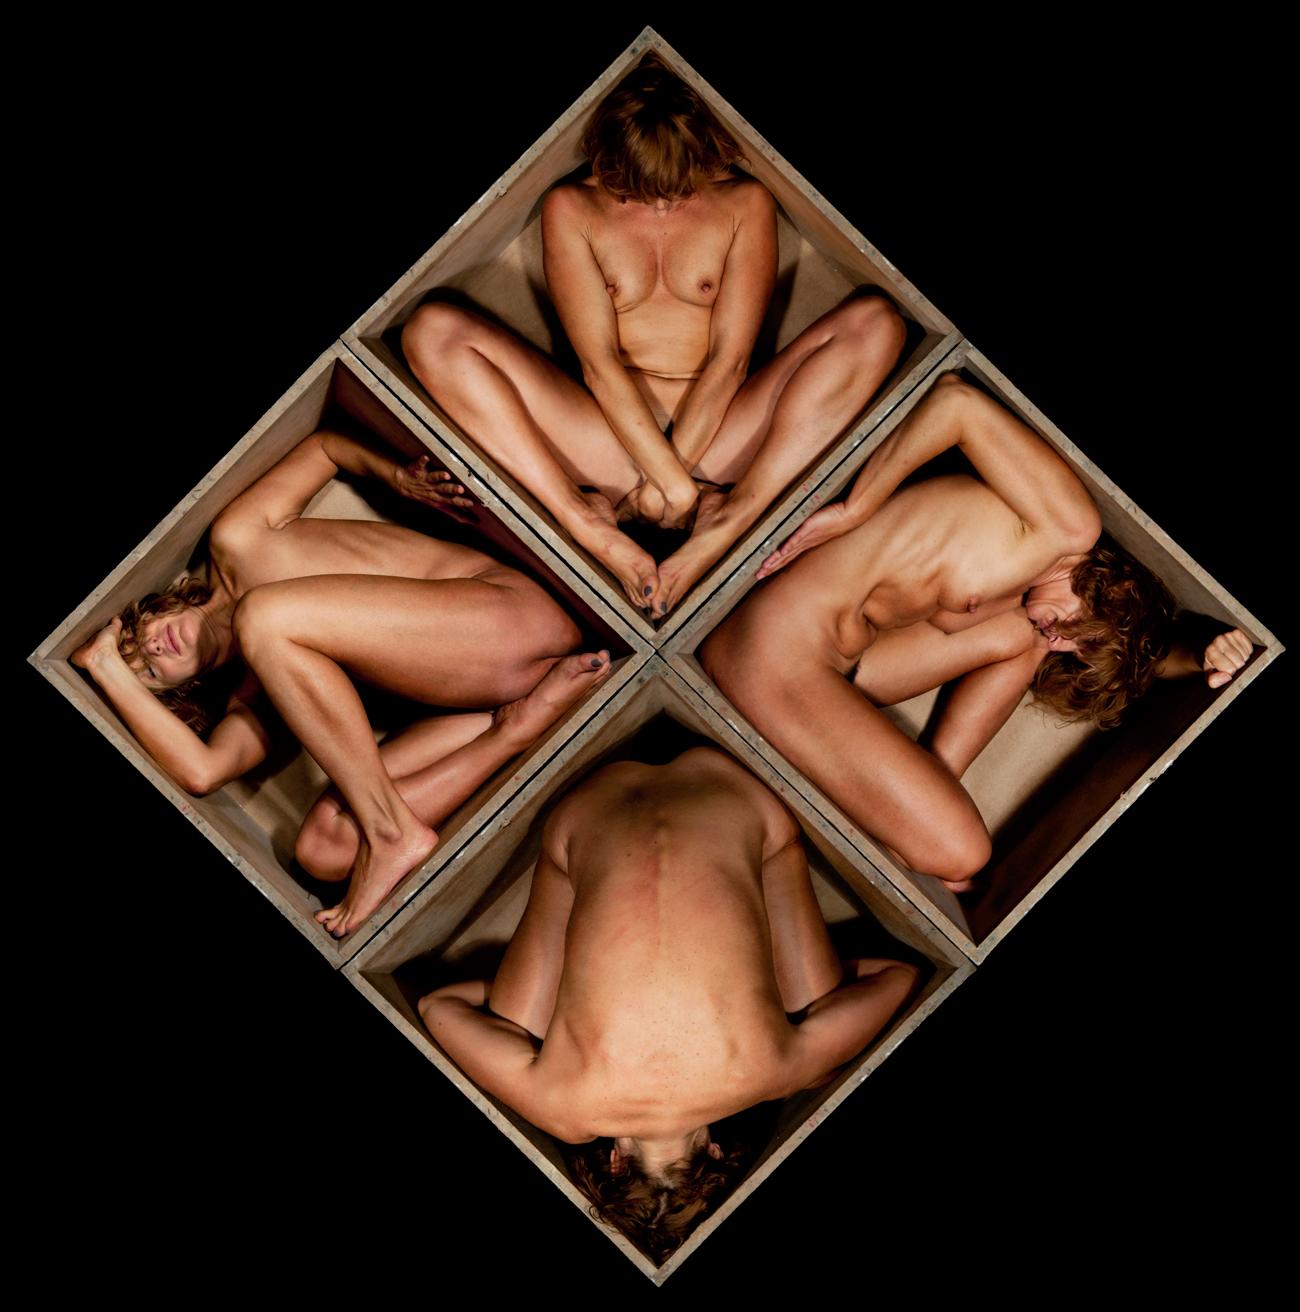 Minimal spaces iii alessandro anemona opera celeste for Minimal art opere